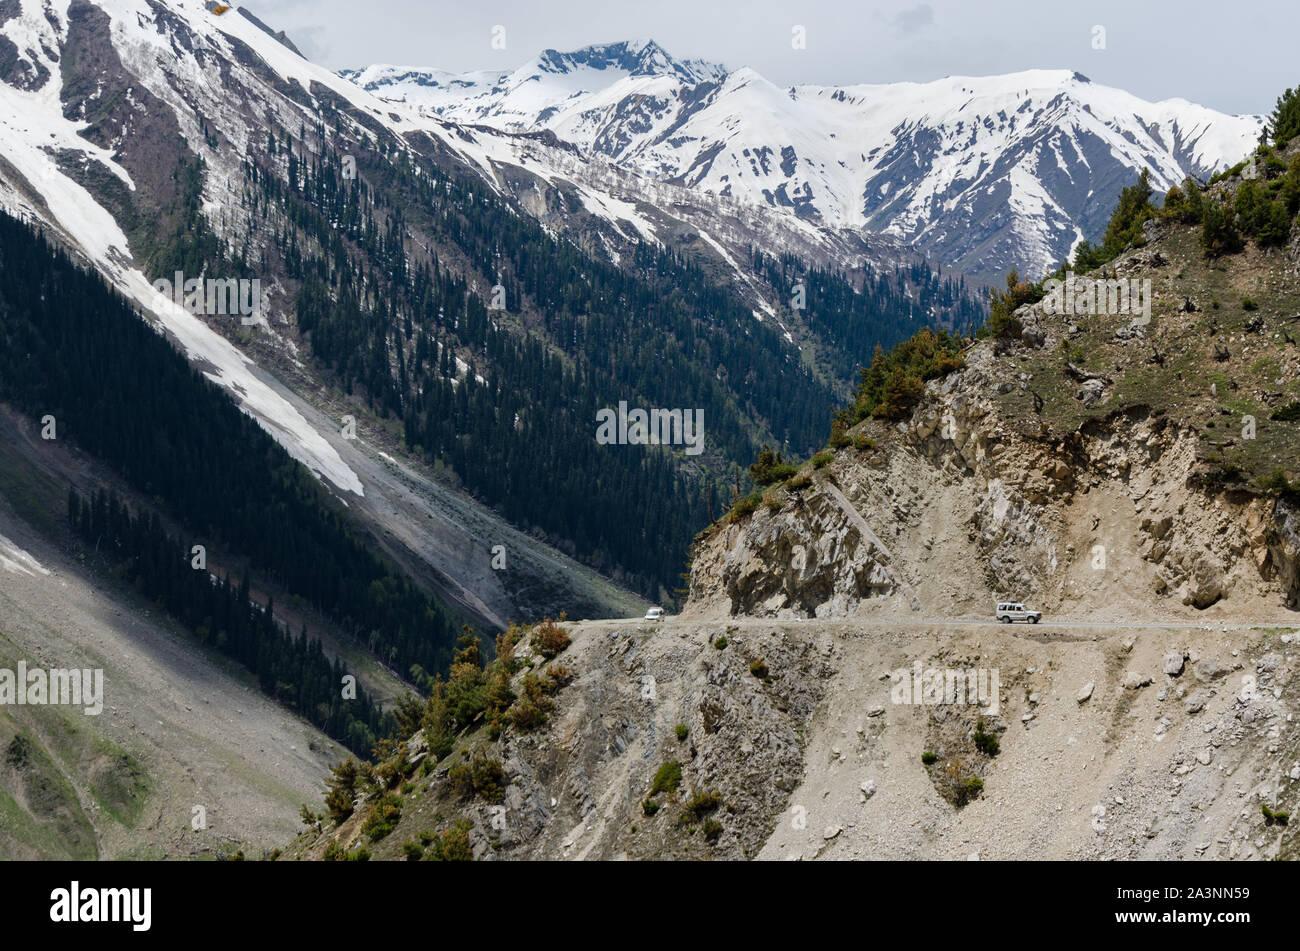 Vehicles making their way up the dangerous Zoji La Pass, Srinagar - Leh National Highway, Jammu and Kashmir, India Stock Photo